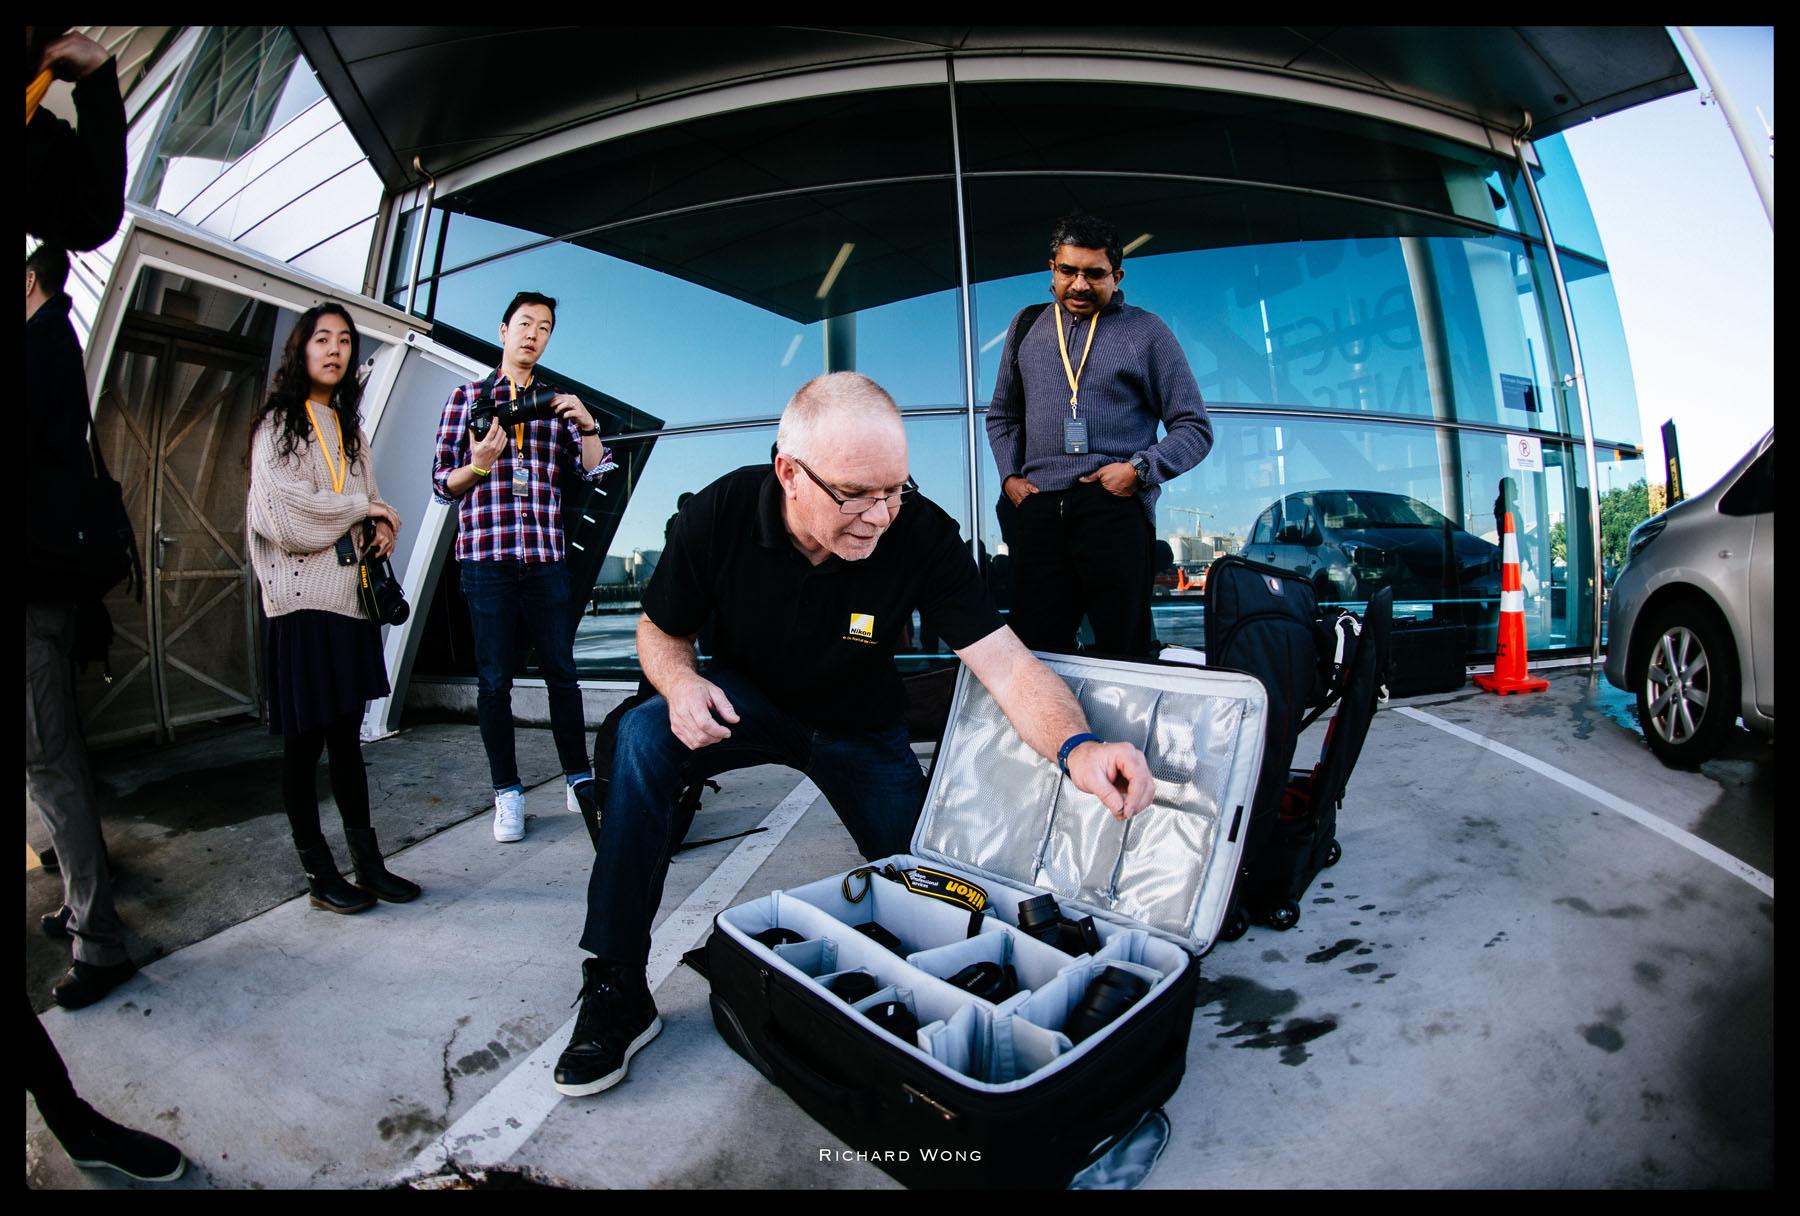 Nikon-Auckland-Photo-Day-2016-03